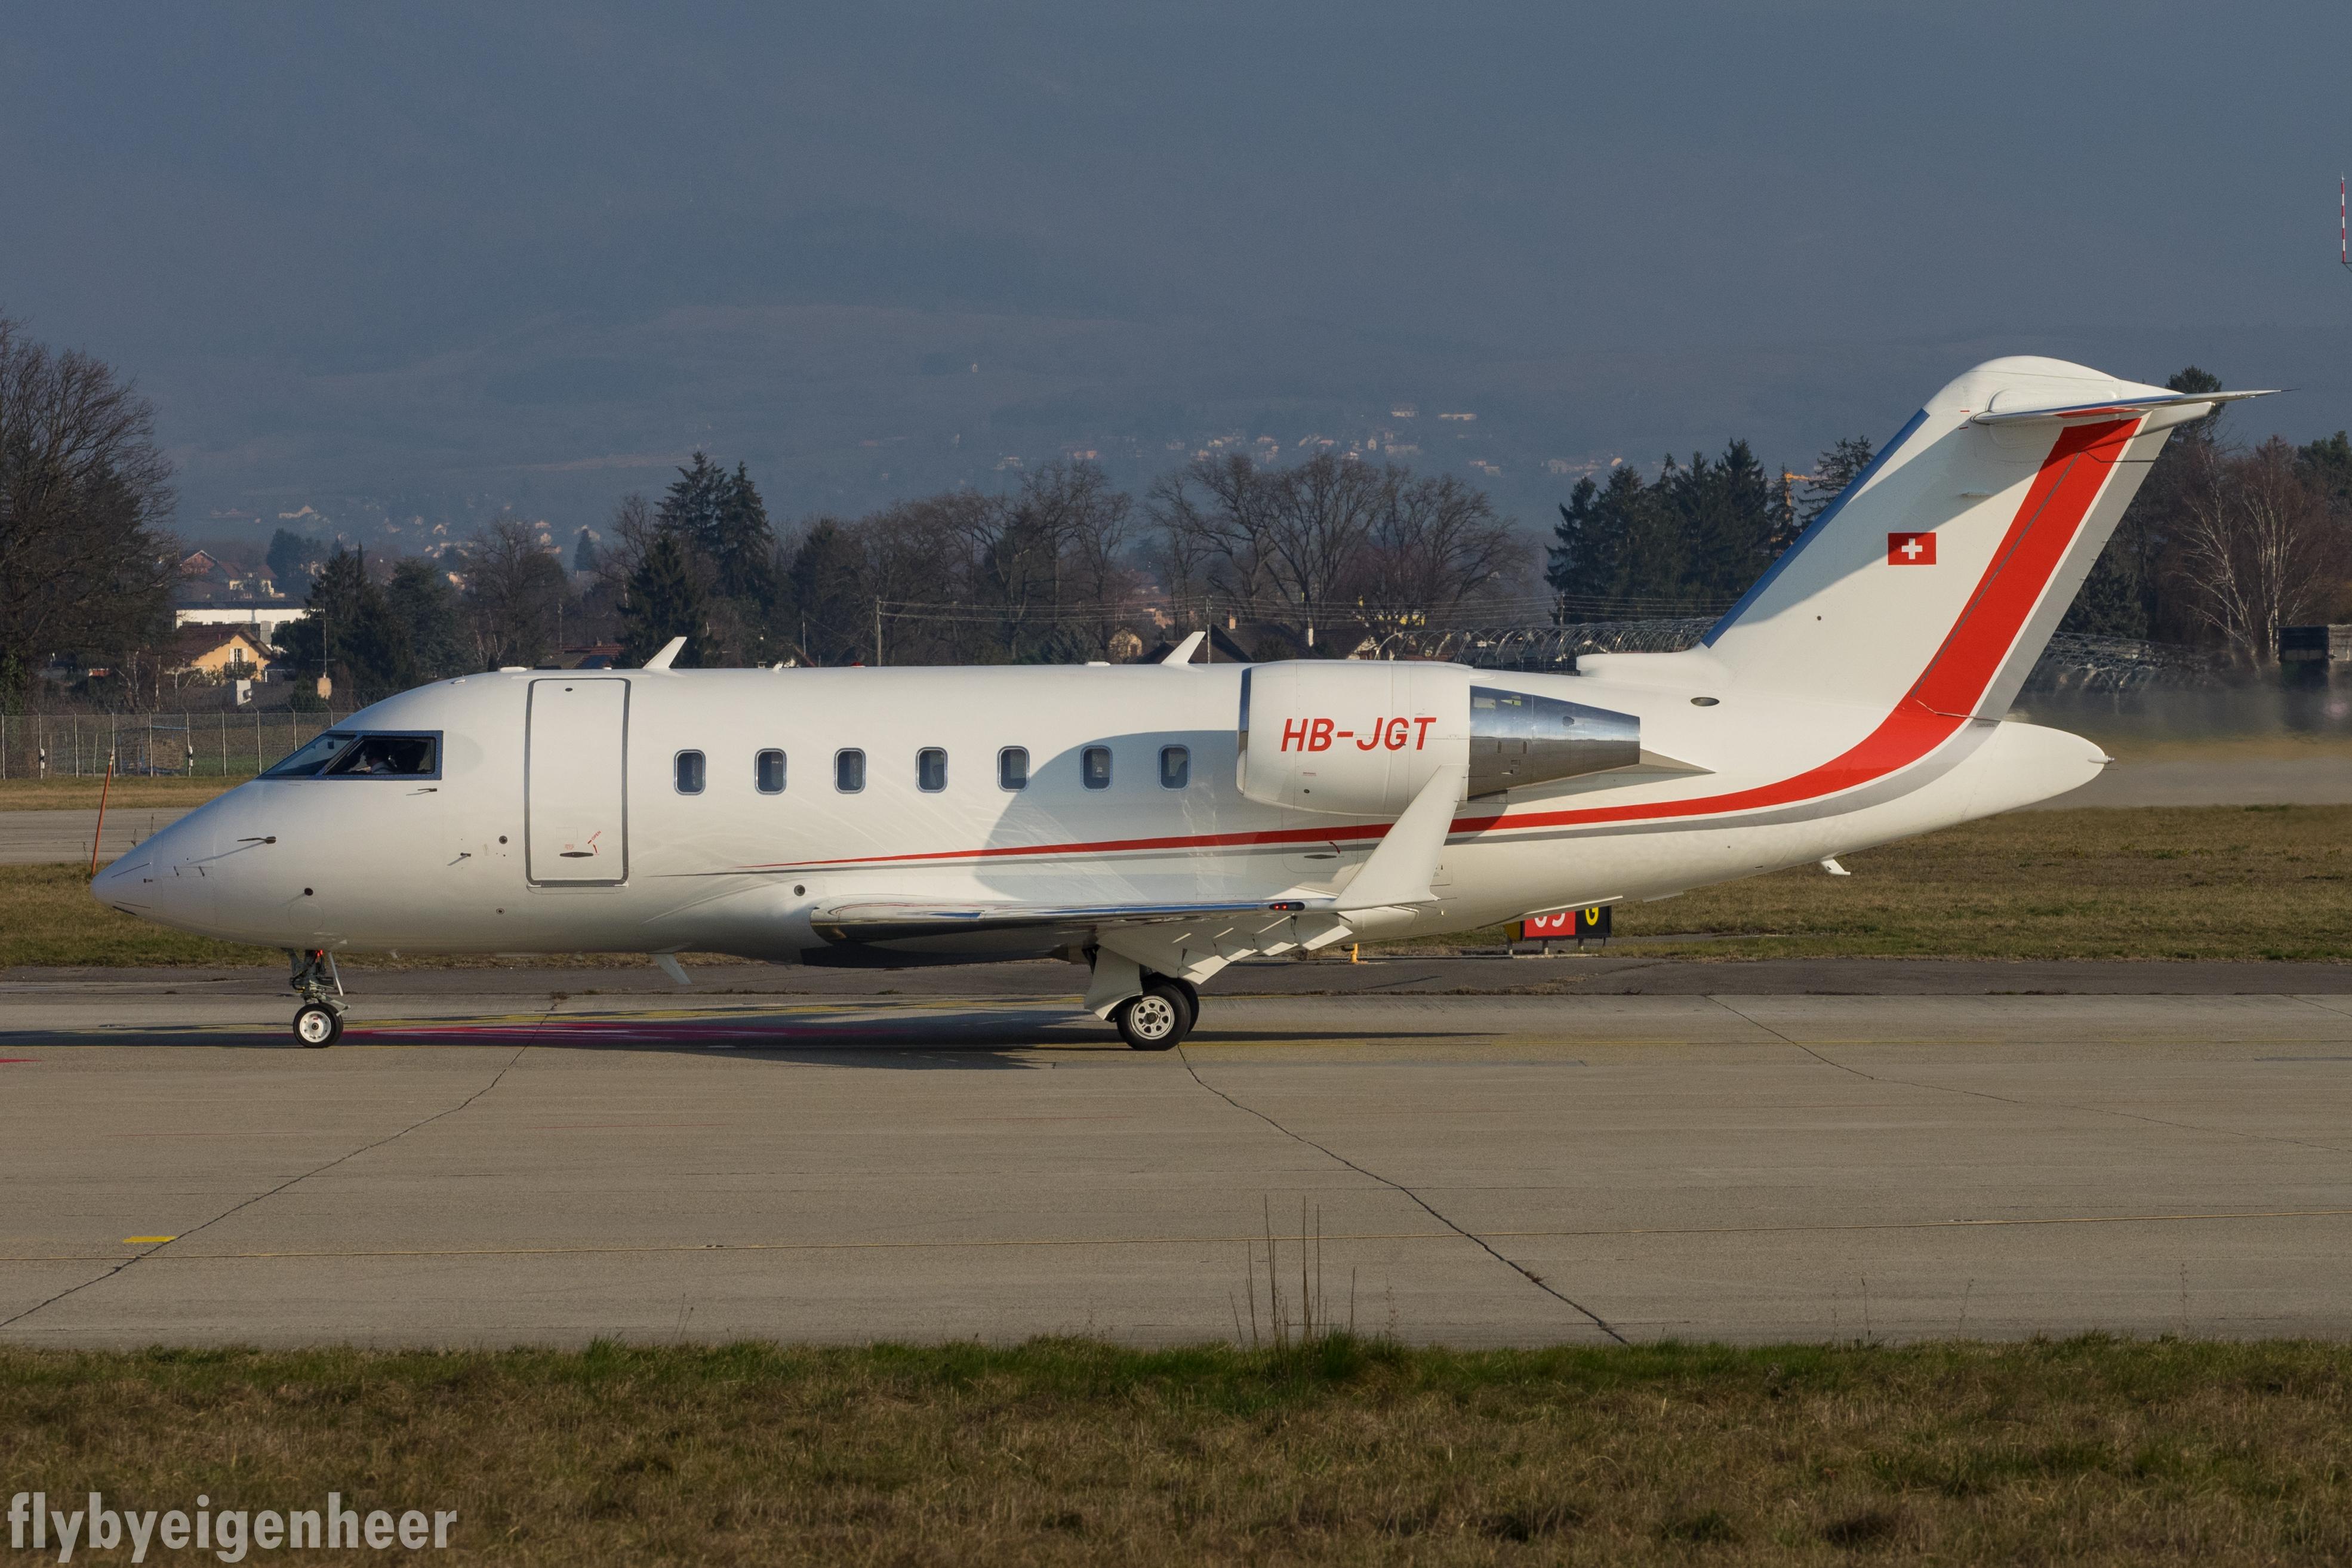 File:HB-JGT Bombardier CL-600-2B16 Challenger 605 CL60 - Scintilla